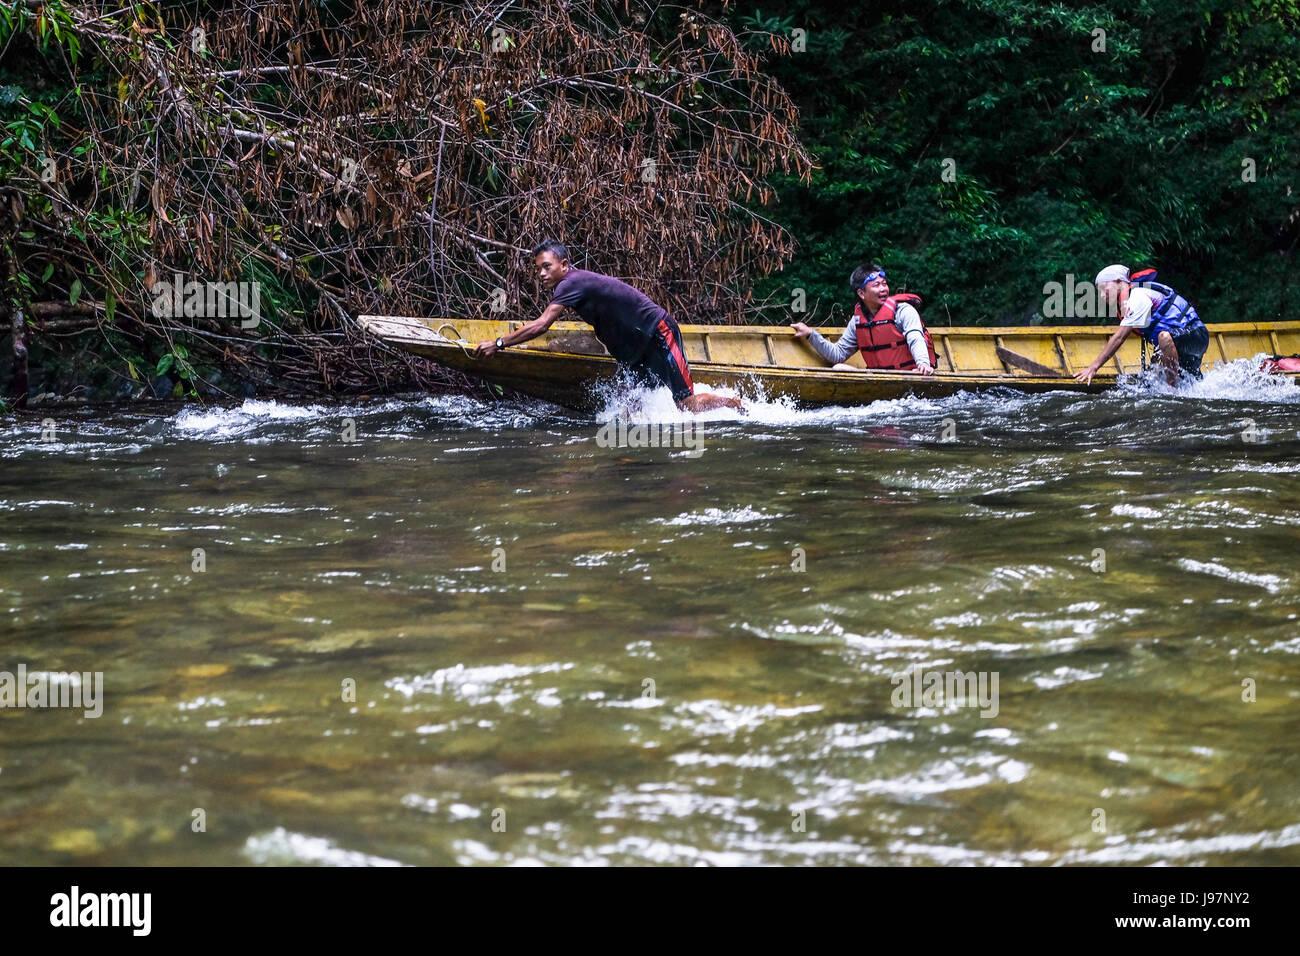 Manoeuvring through the wild river of Kalimantan Borneo. - Stock Image